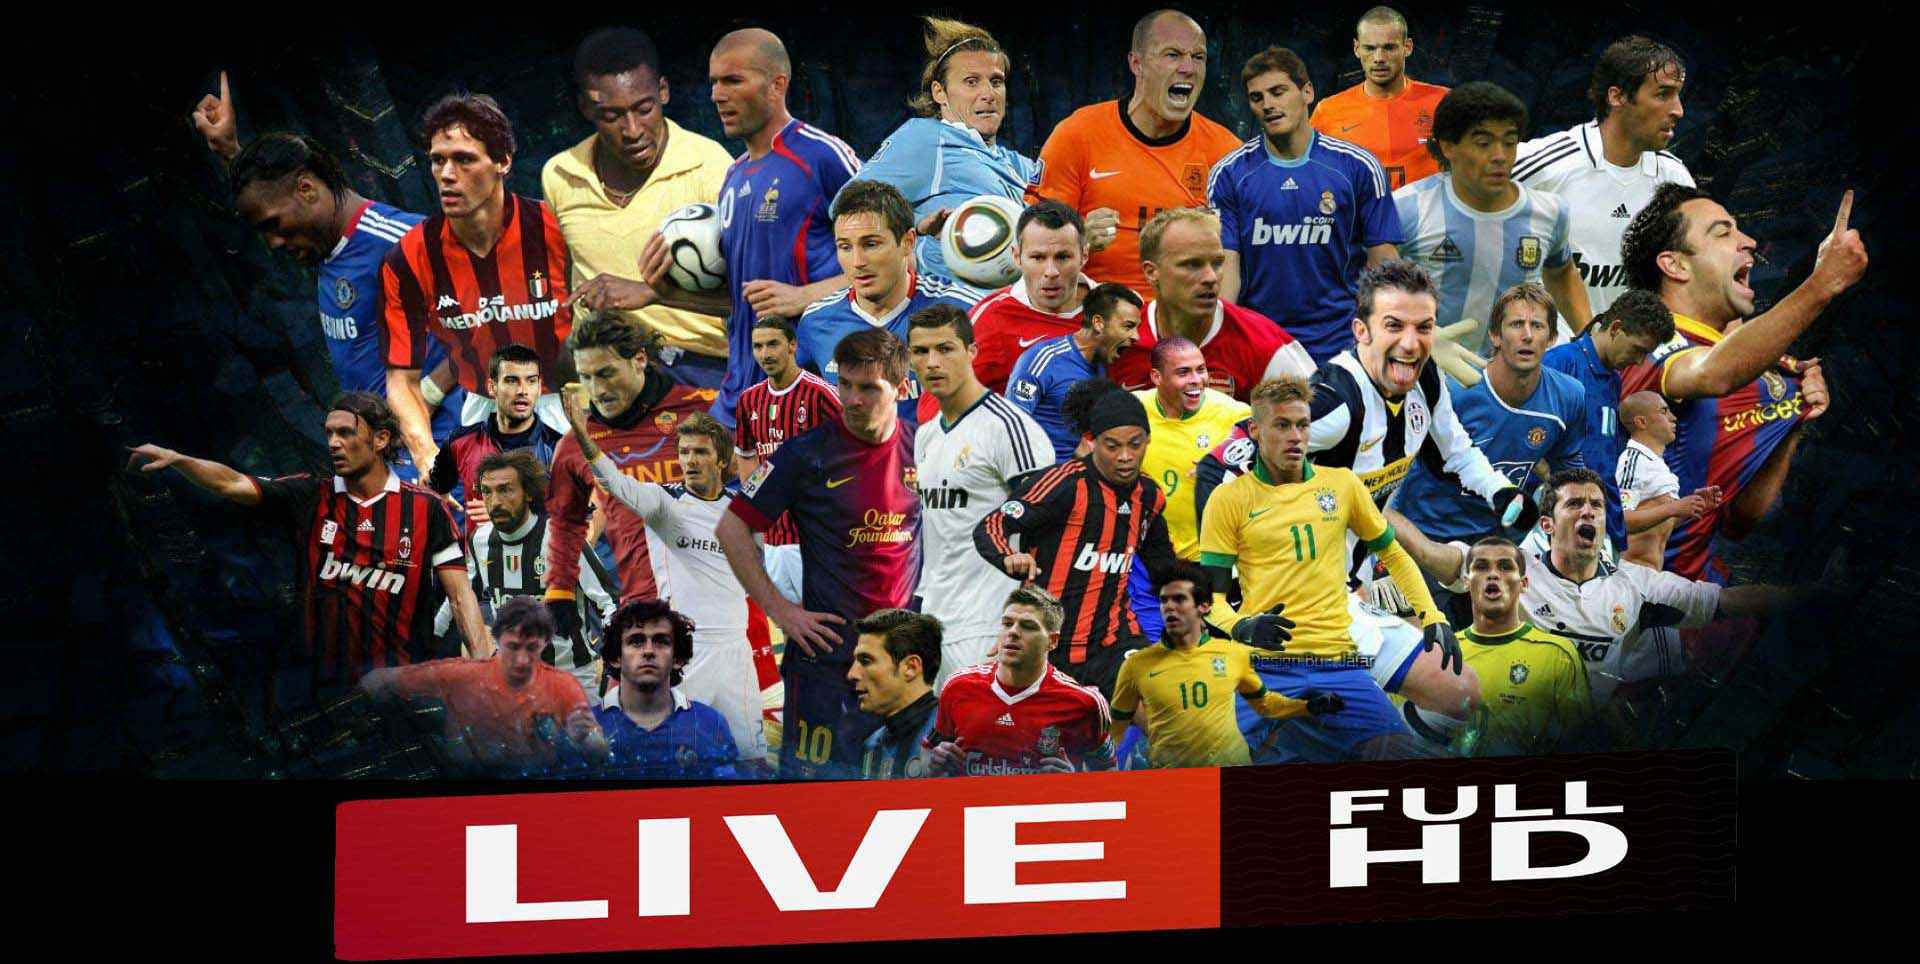 Napoli Vs Benfica live